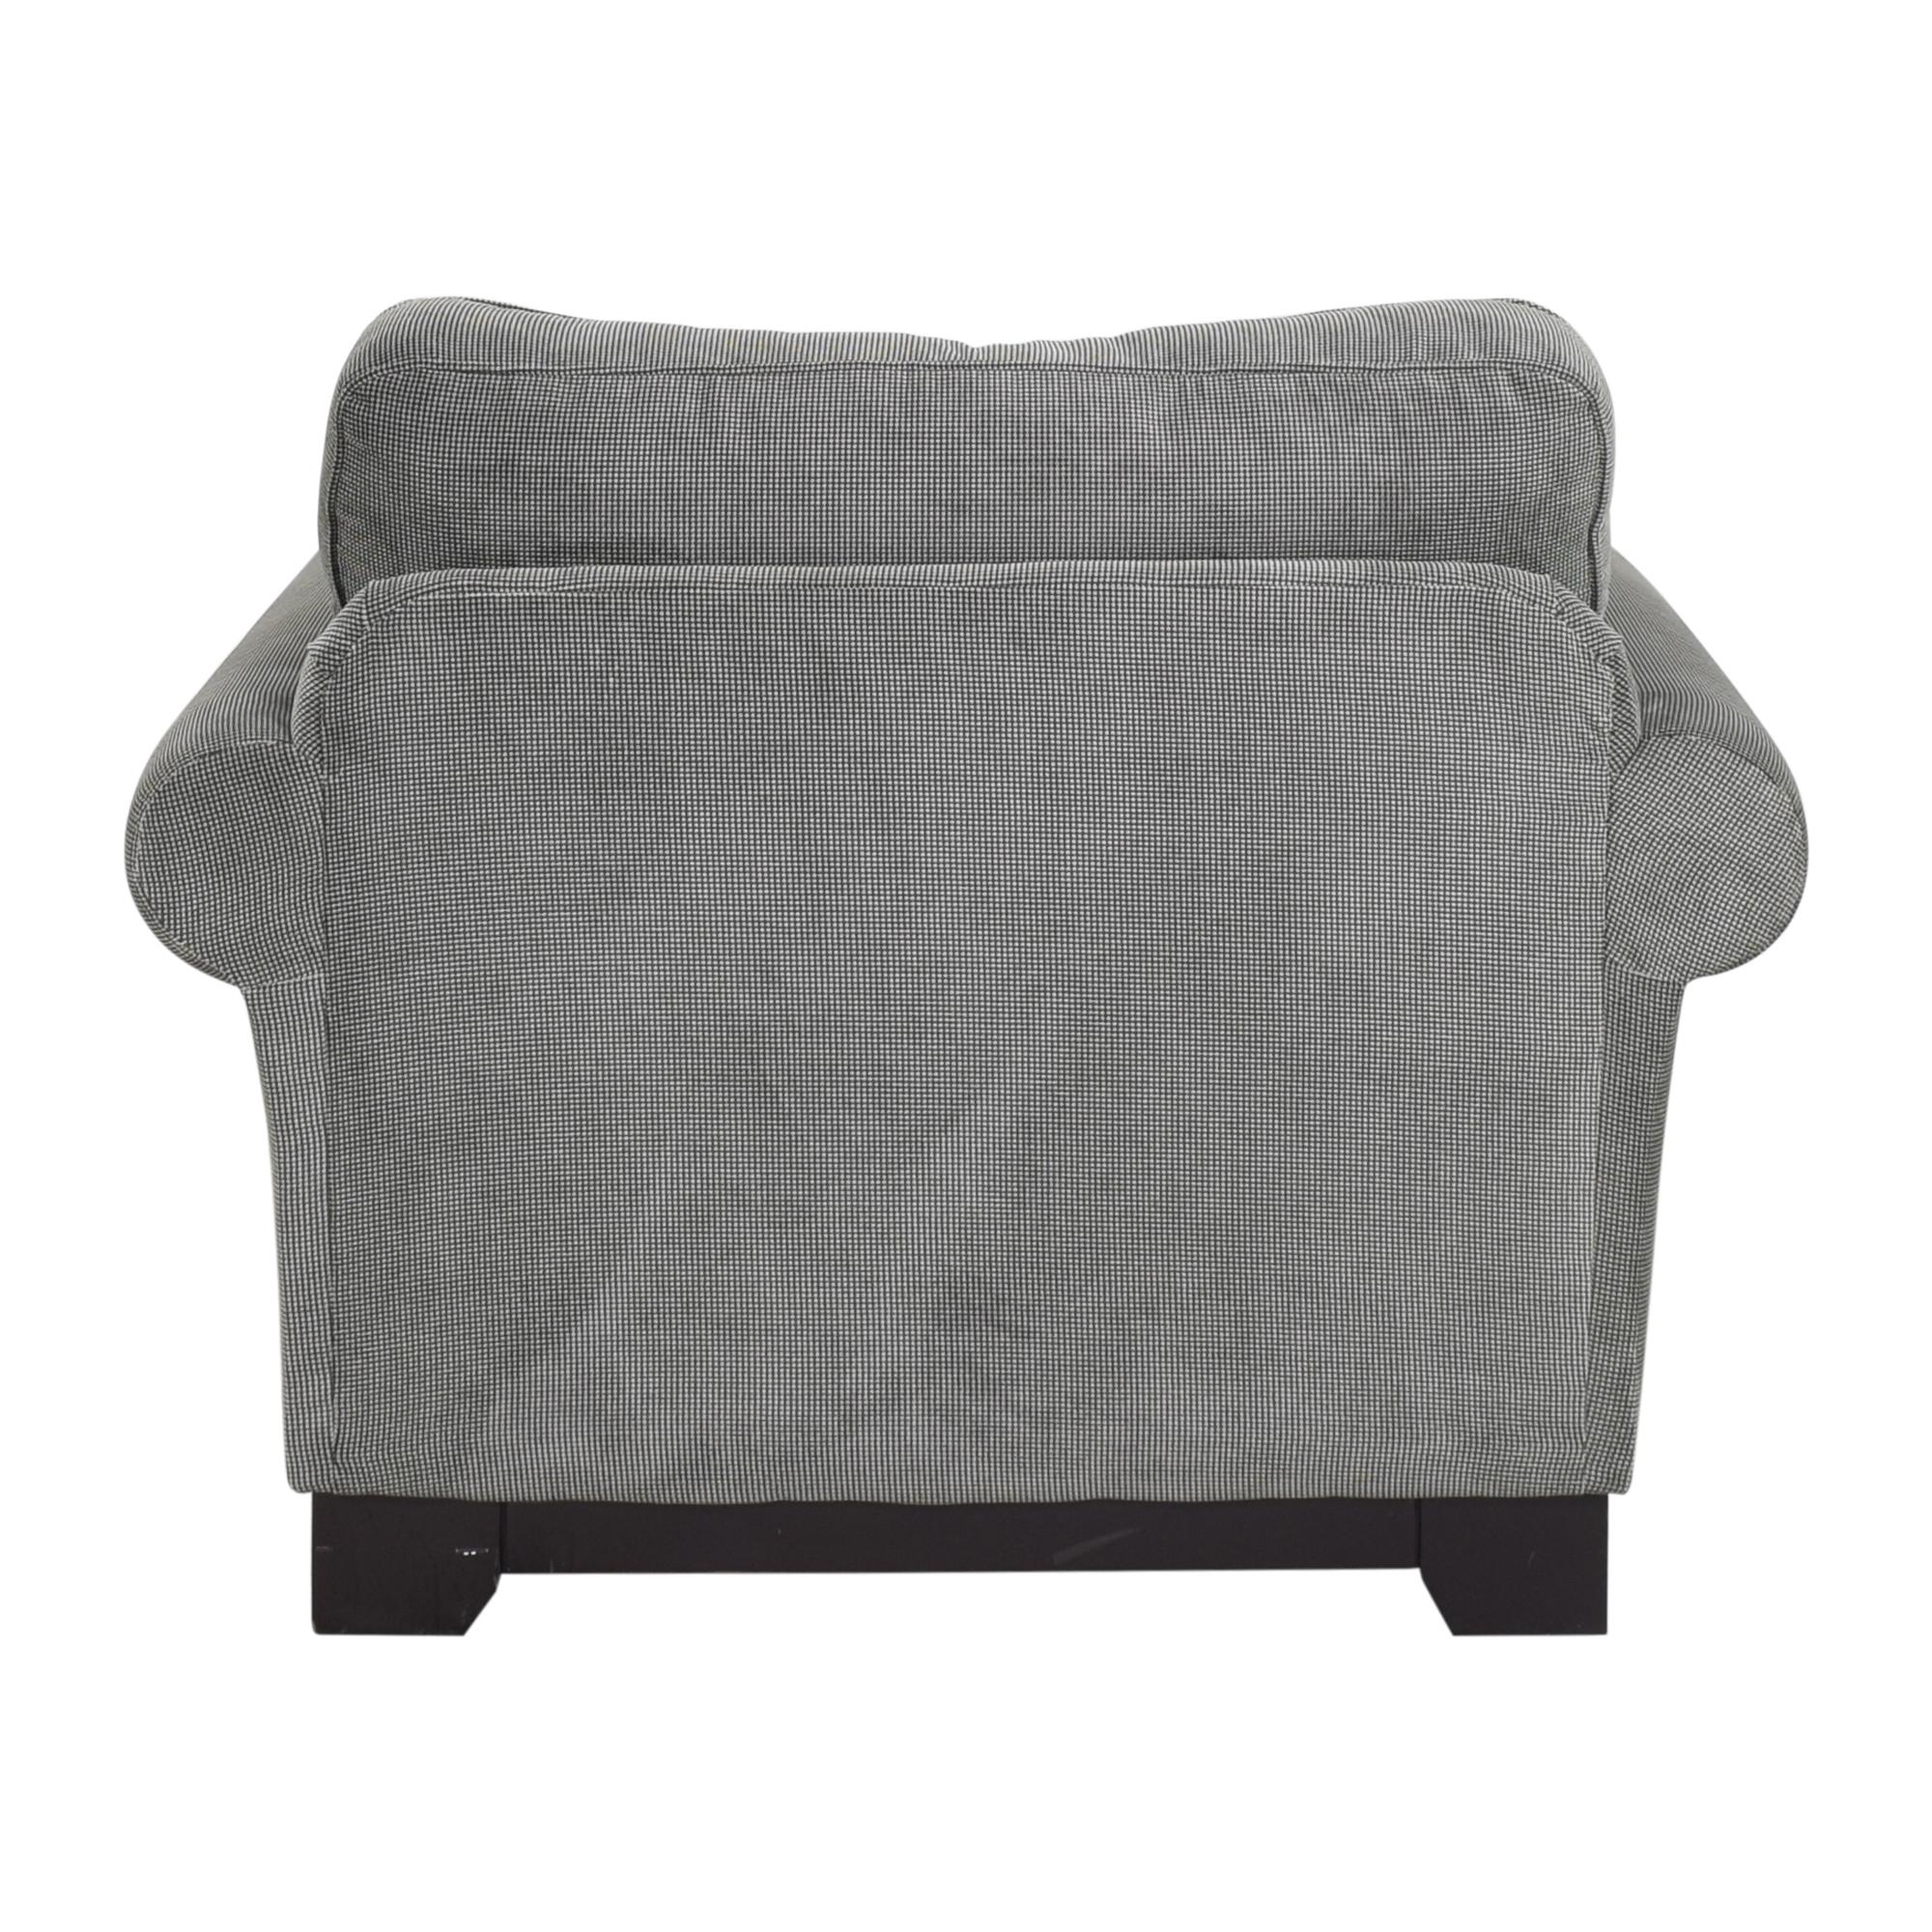 Macy's Macy's Medland Armchair with Ottoman gray